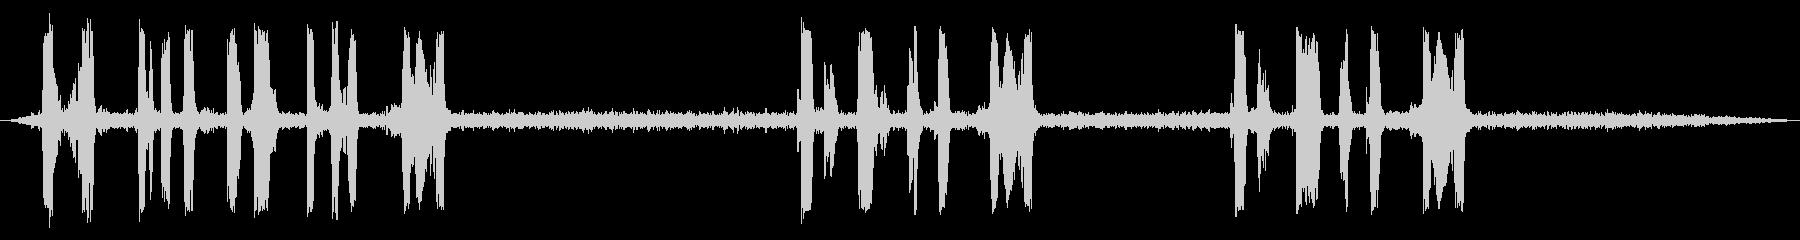 L-1011旅客ジェット:内部:コ...の未再生の波形